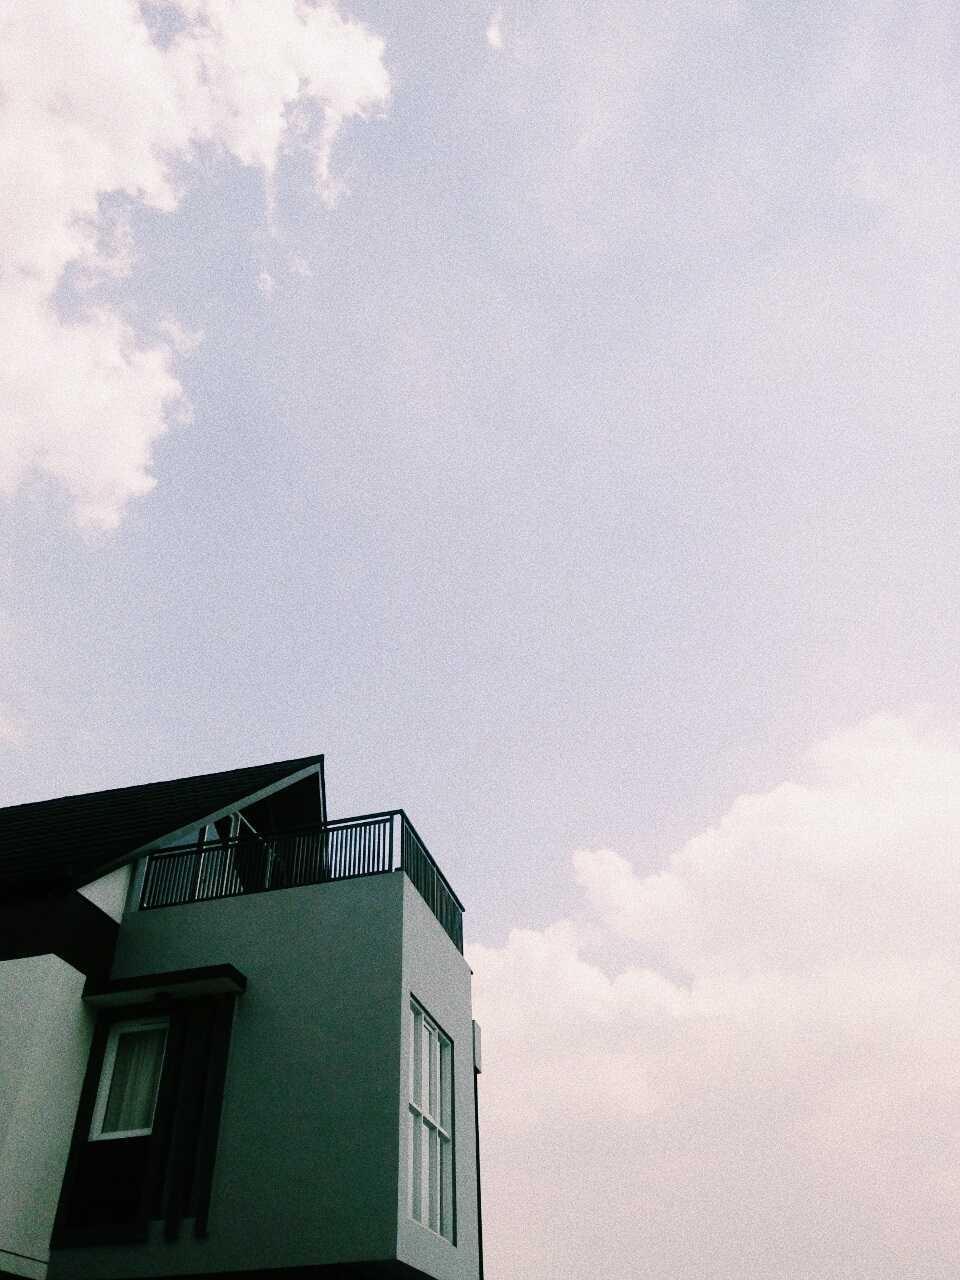 Qavah Architect Attic House Renovation Gegerkalong, Kec. Sukasari, Kota Bandung, Jawa Barat, Indonesia Gegerkalong, Kec. Sukasari, Kota Bandung, Jawa Barat, Indonesia Qavah-Architect-Attic-House-Renovation  90452